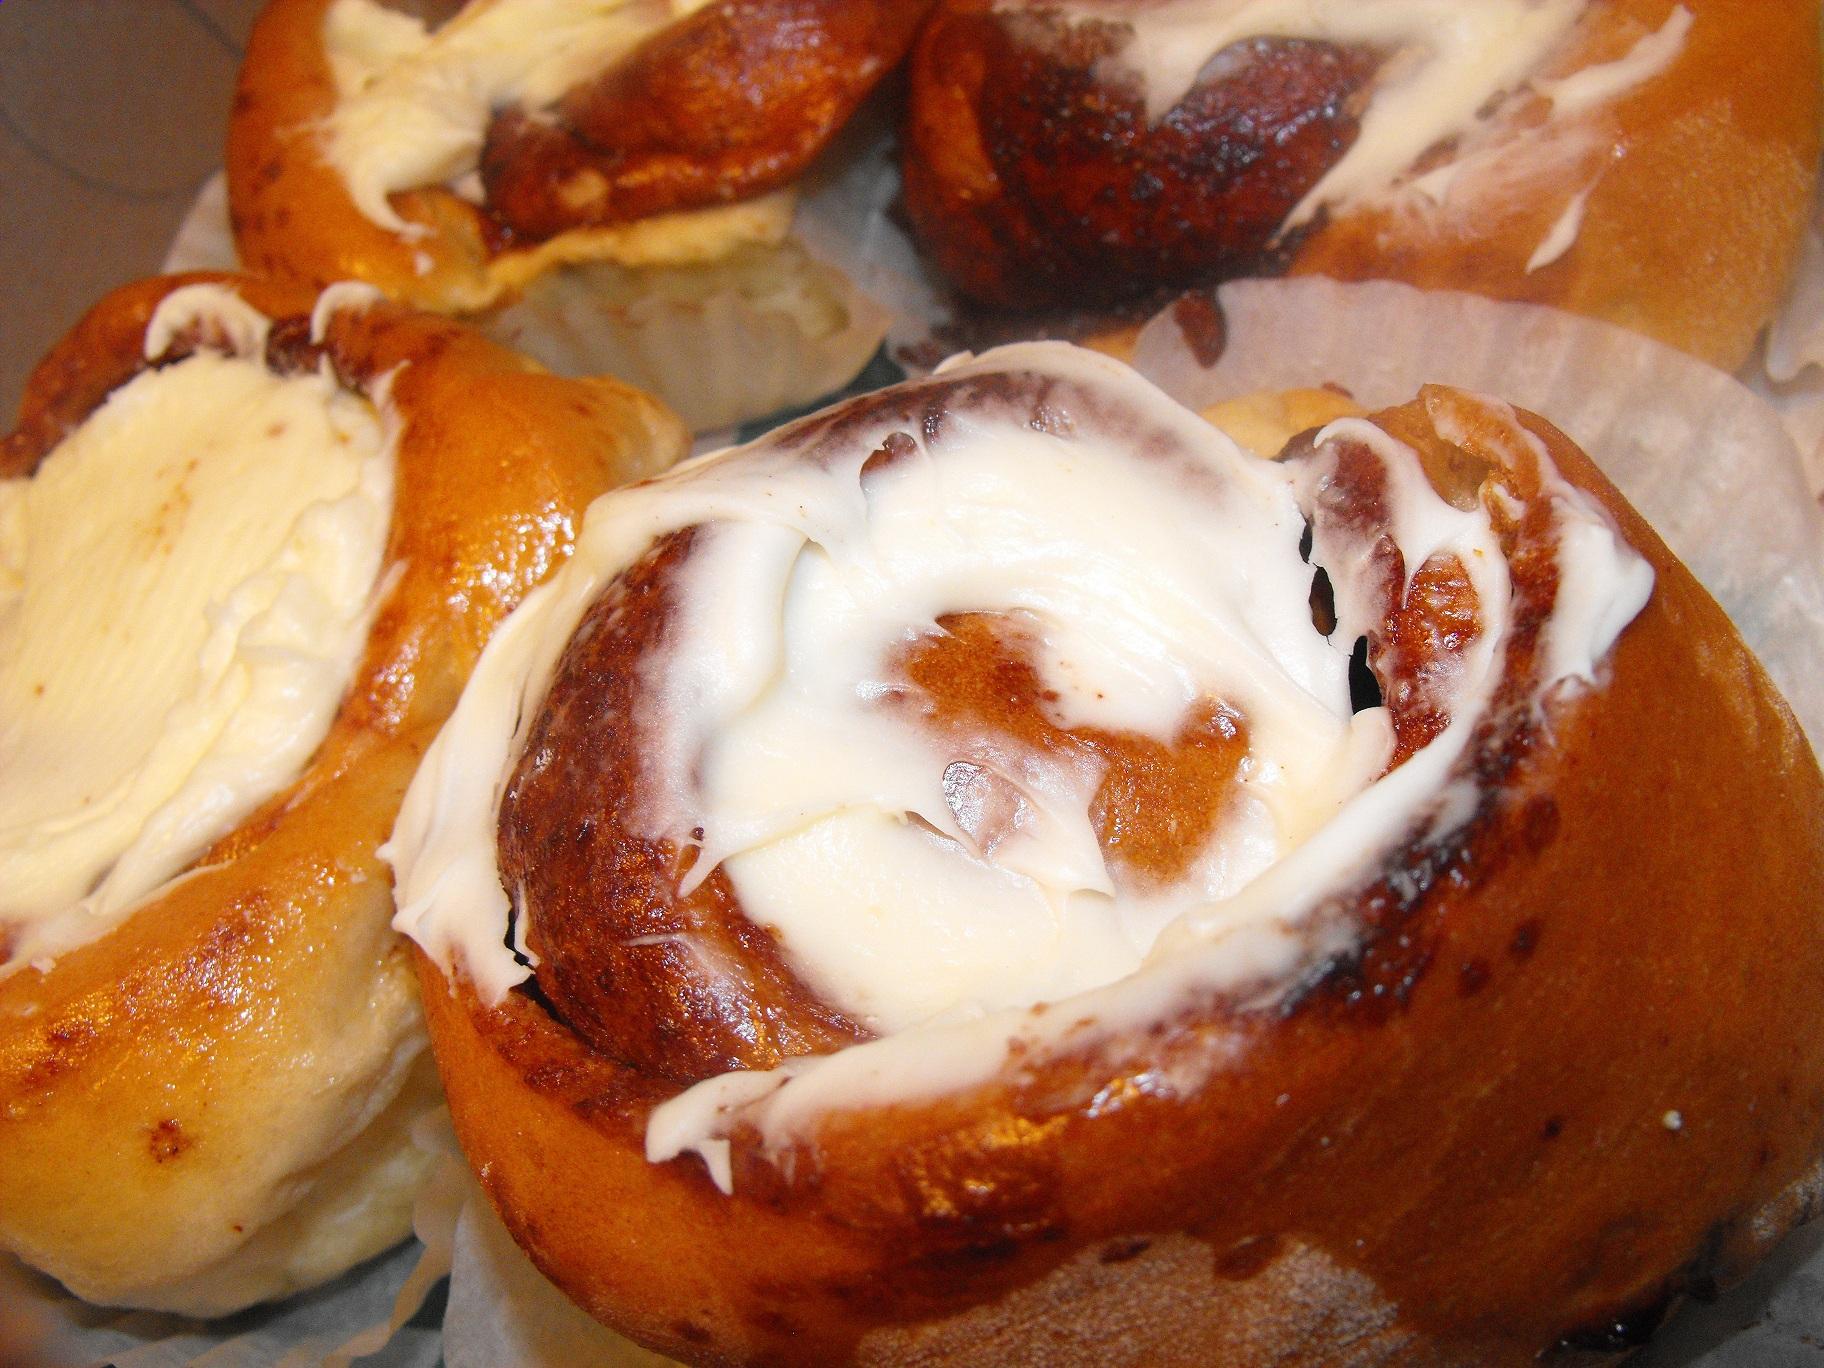 http://foodloader.net/cutie_2011-06-28_Cobbs_Bread_Cinnamon.jpg